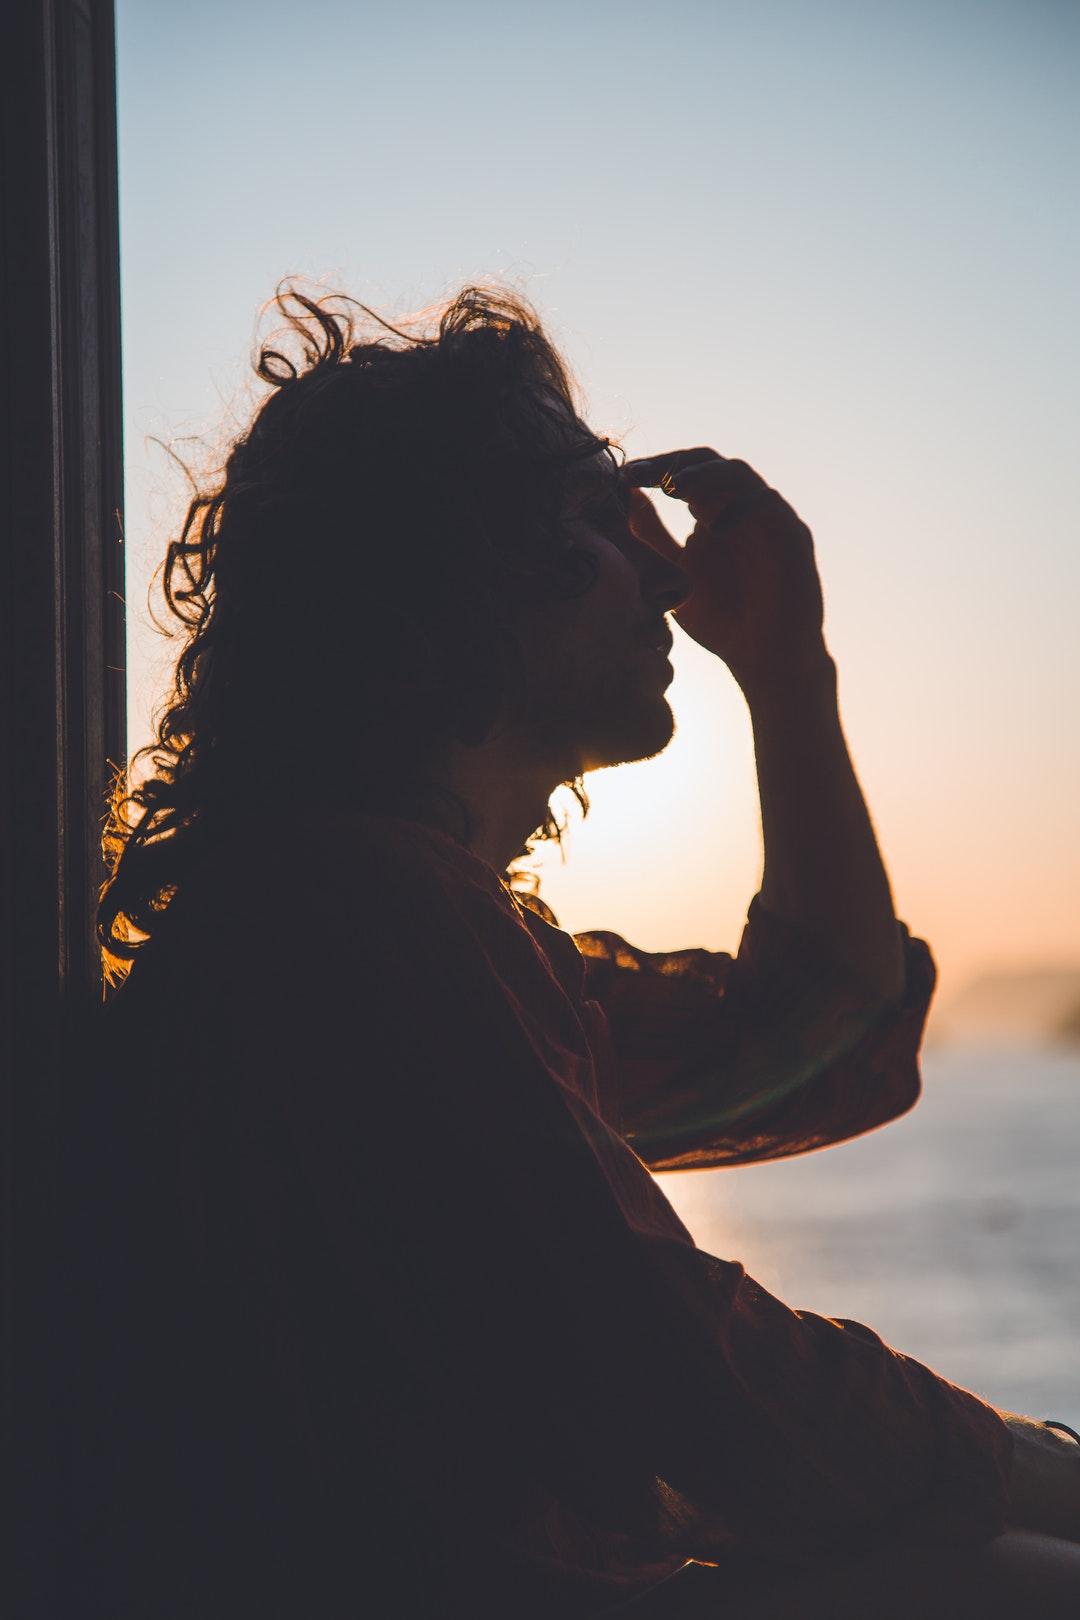 man holding forehead under sunset